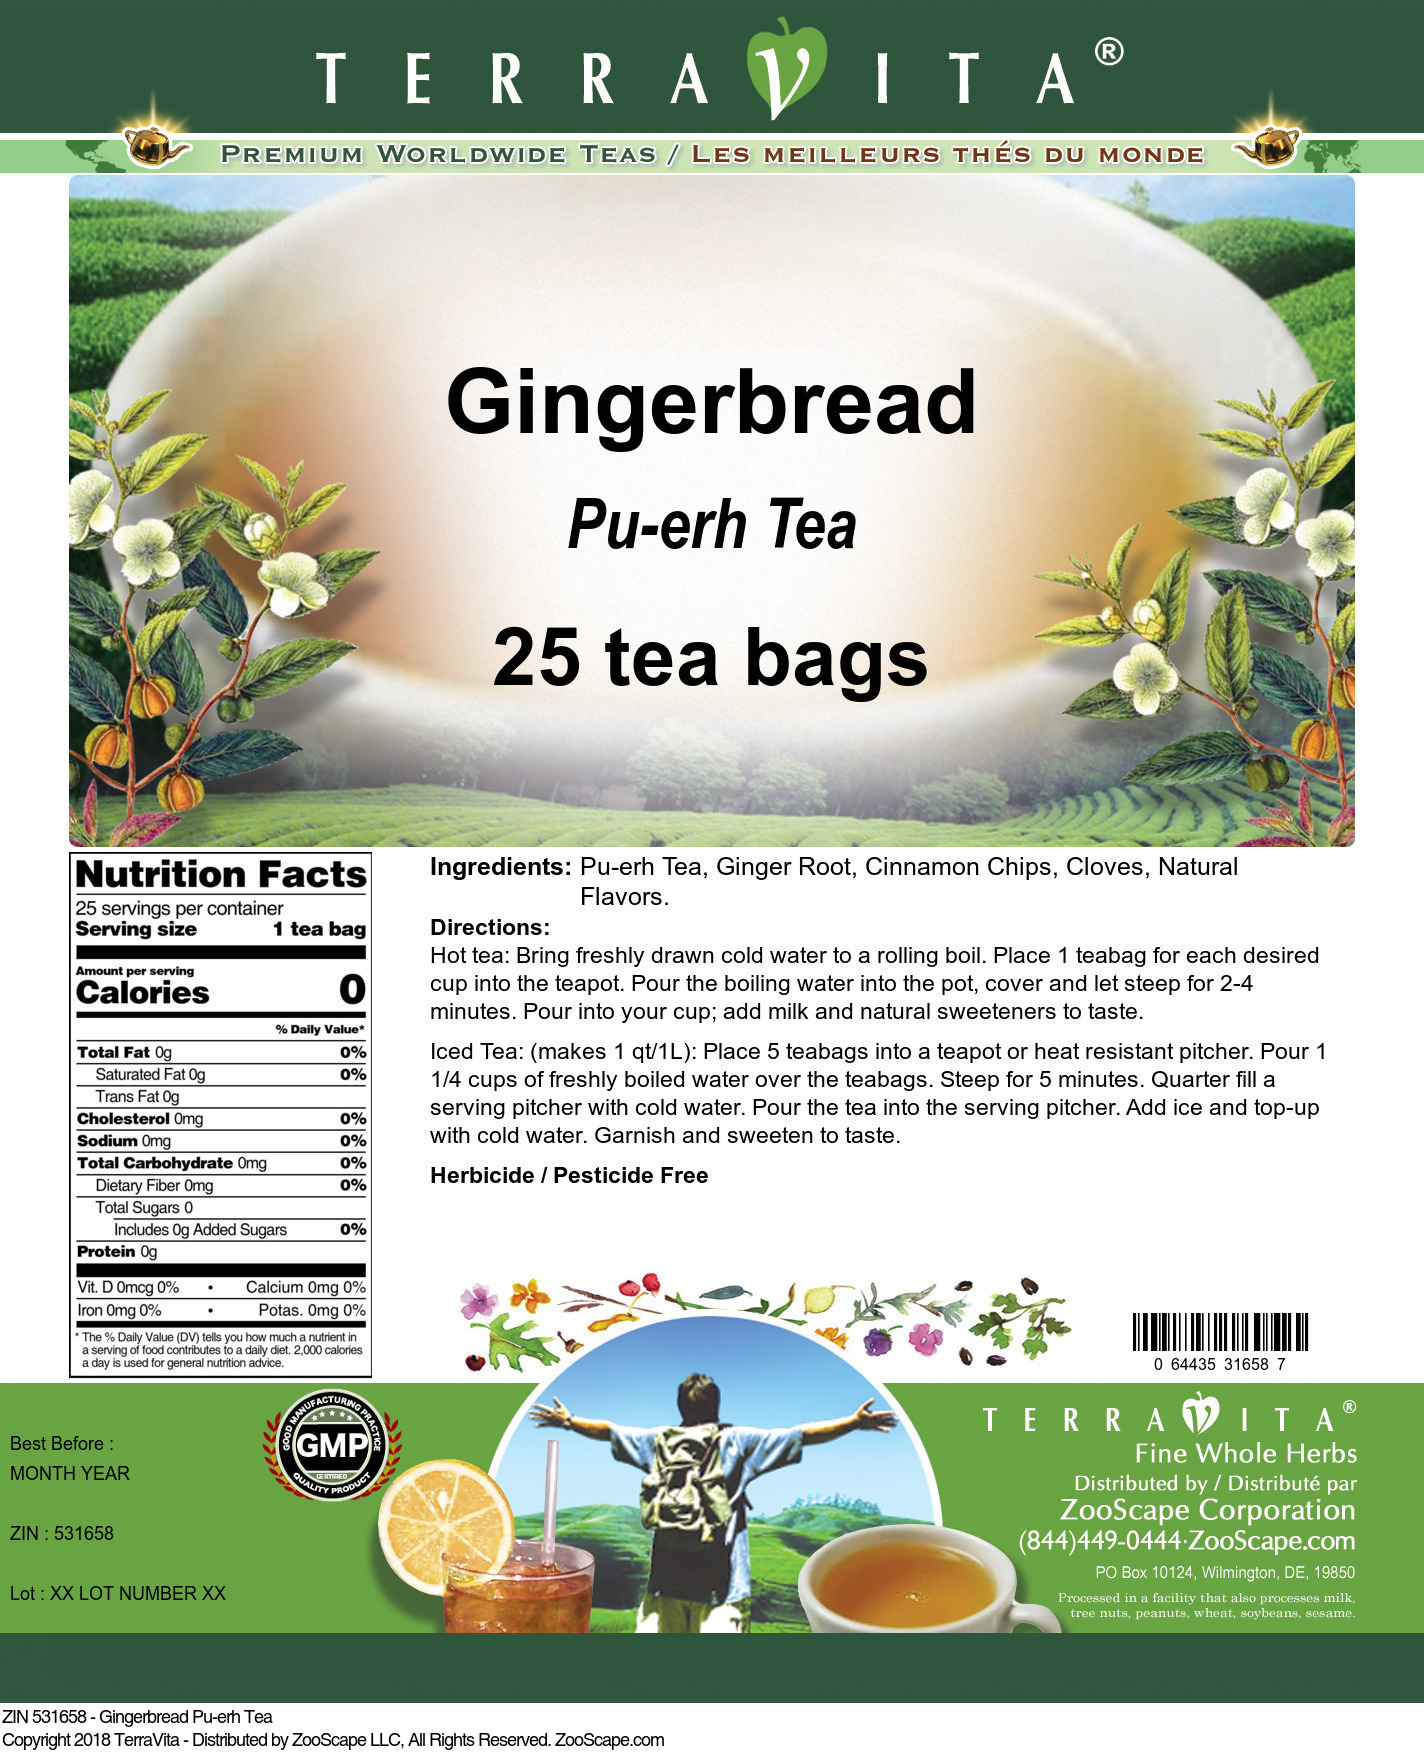 Gingerbread Pu-erh Tea